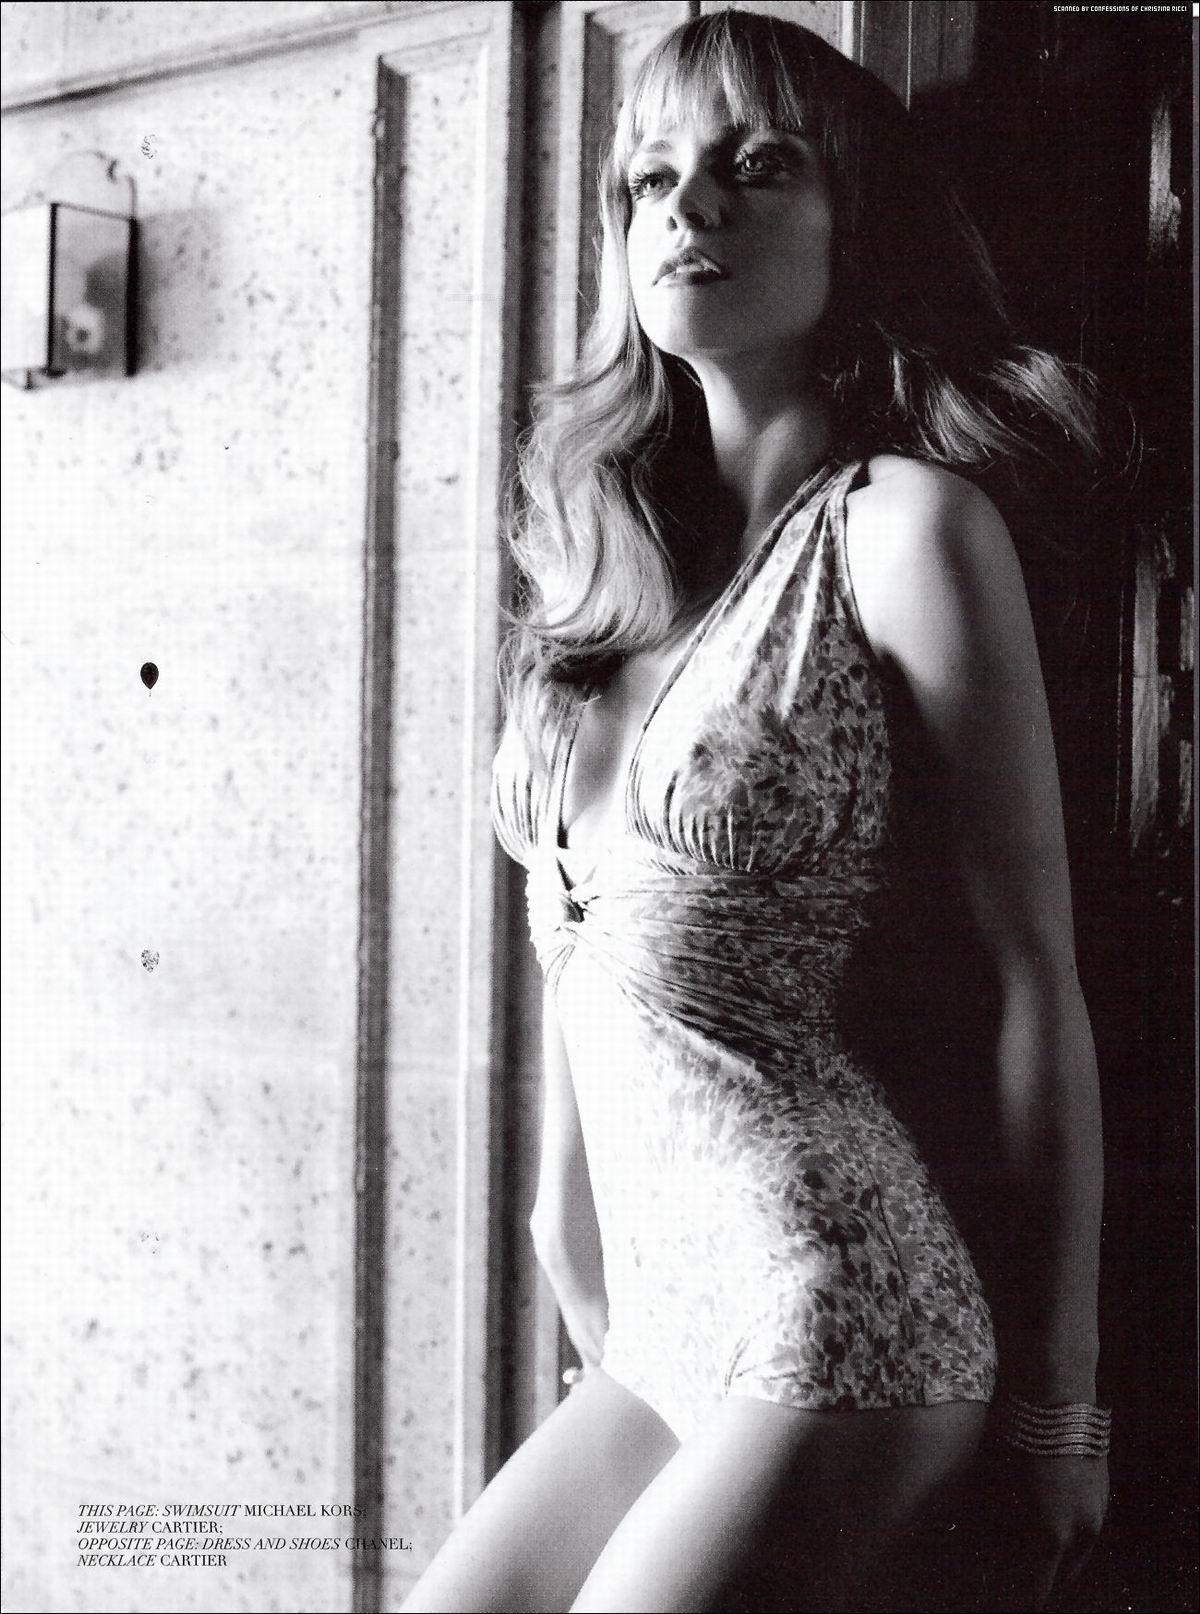 Кристина Риччи (Christina Ricci) голая, фото в журнале Giant, май 2008